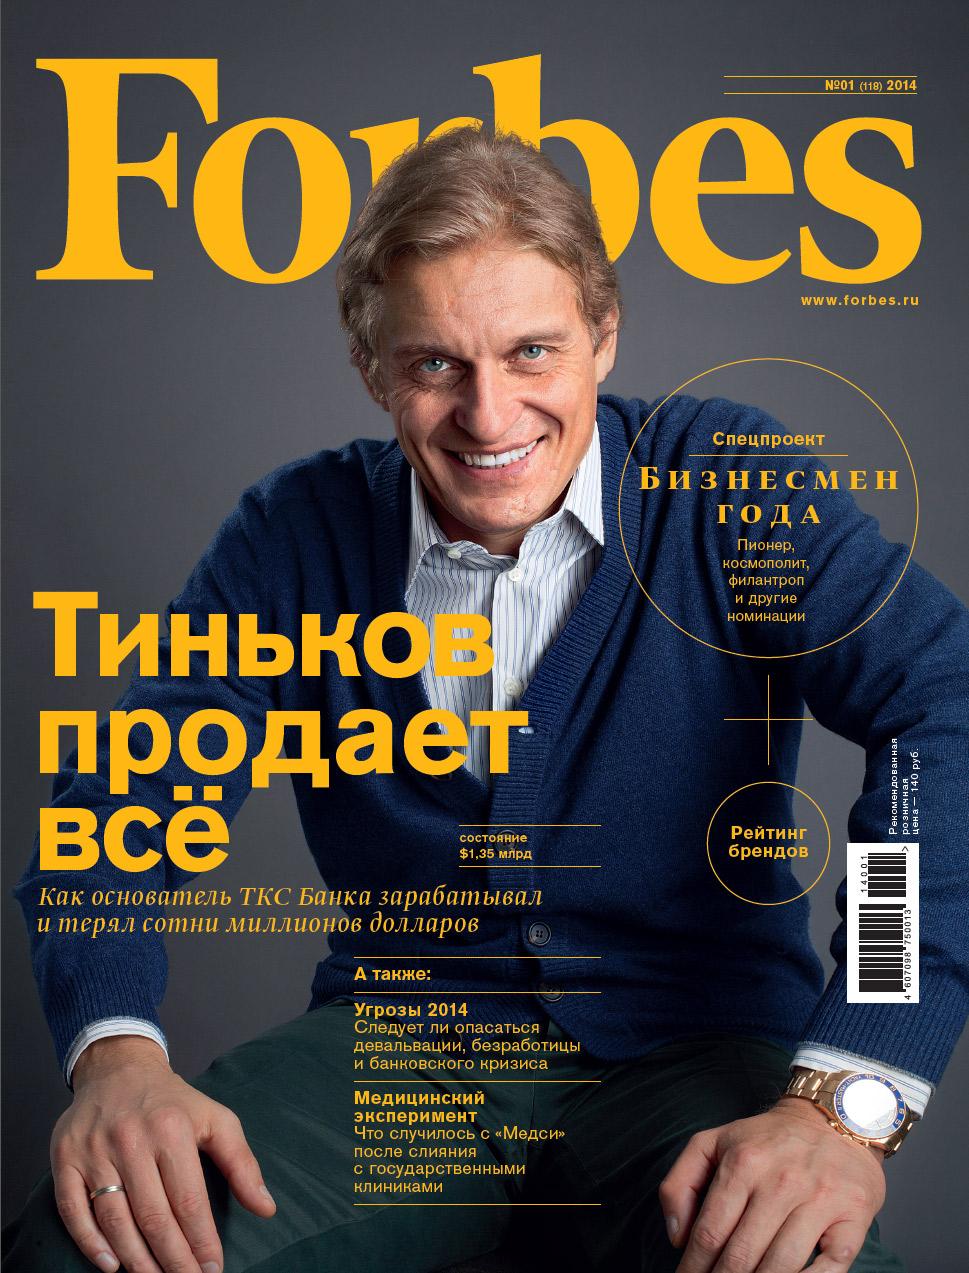 Олег Тиньков на обложке Forbes